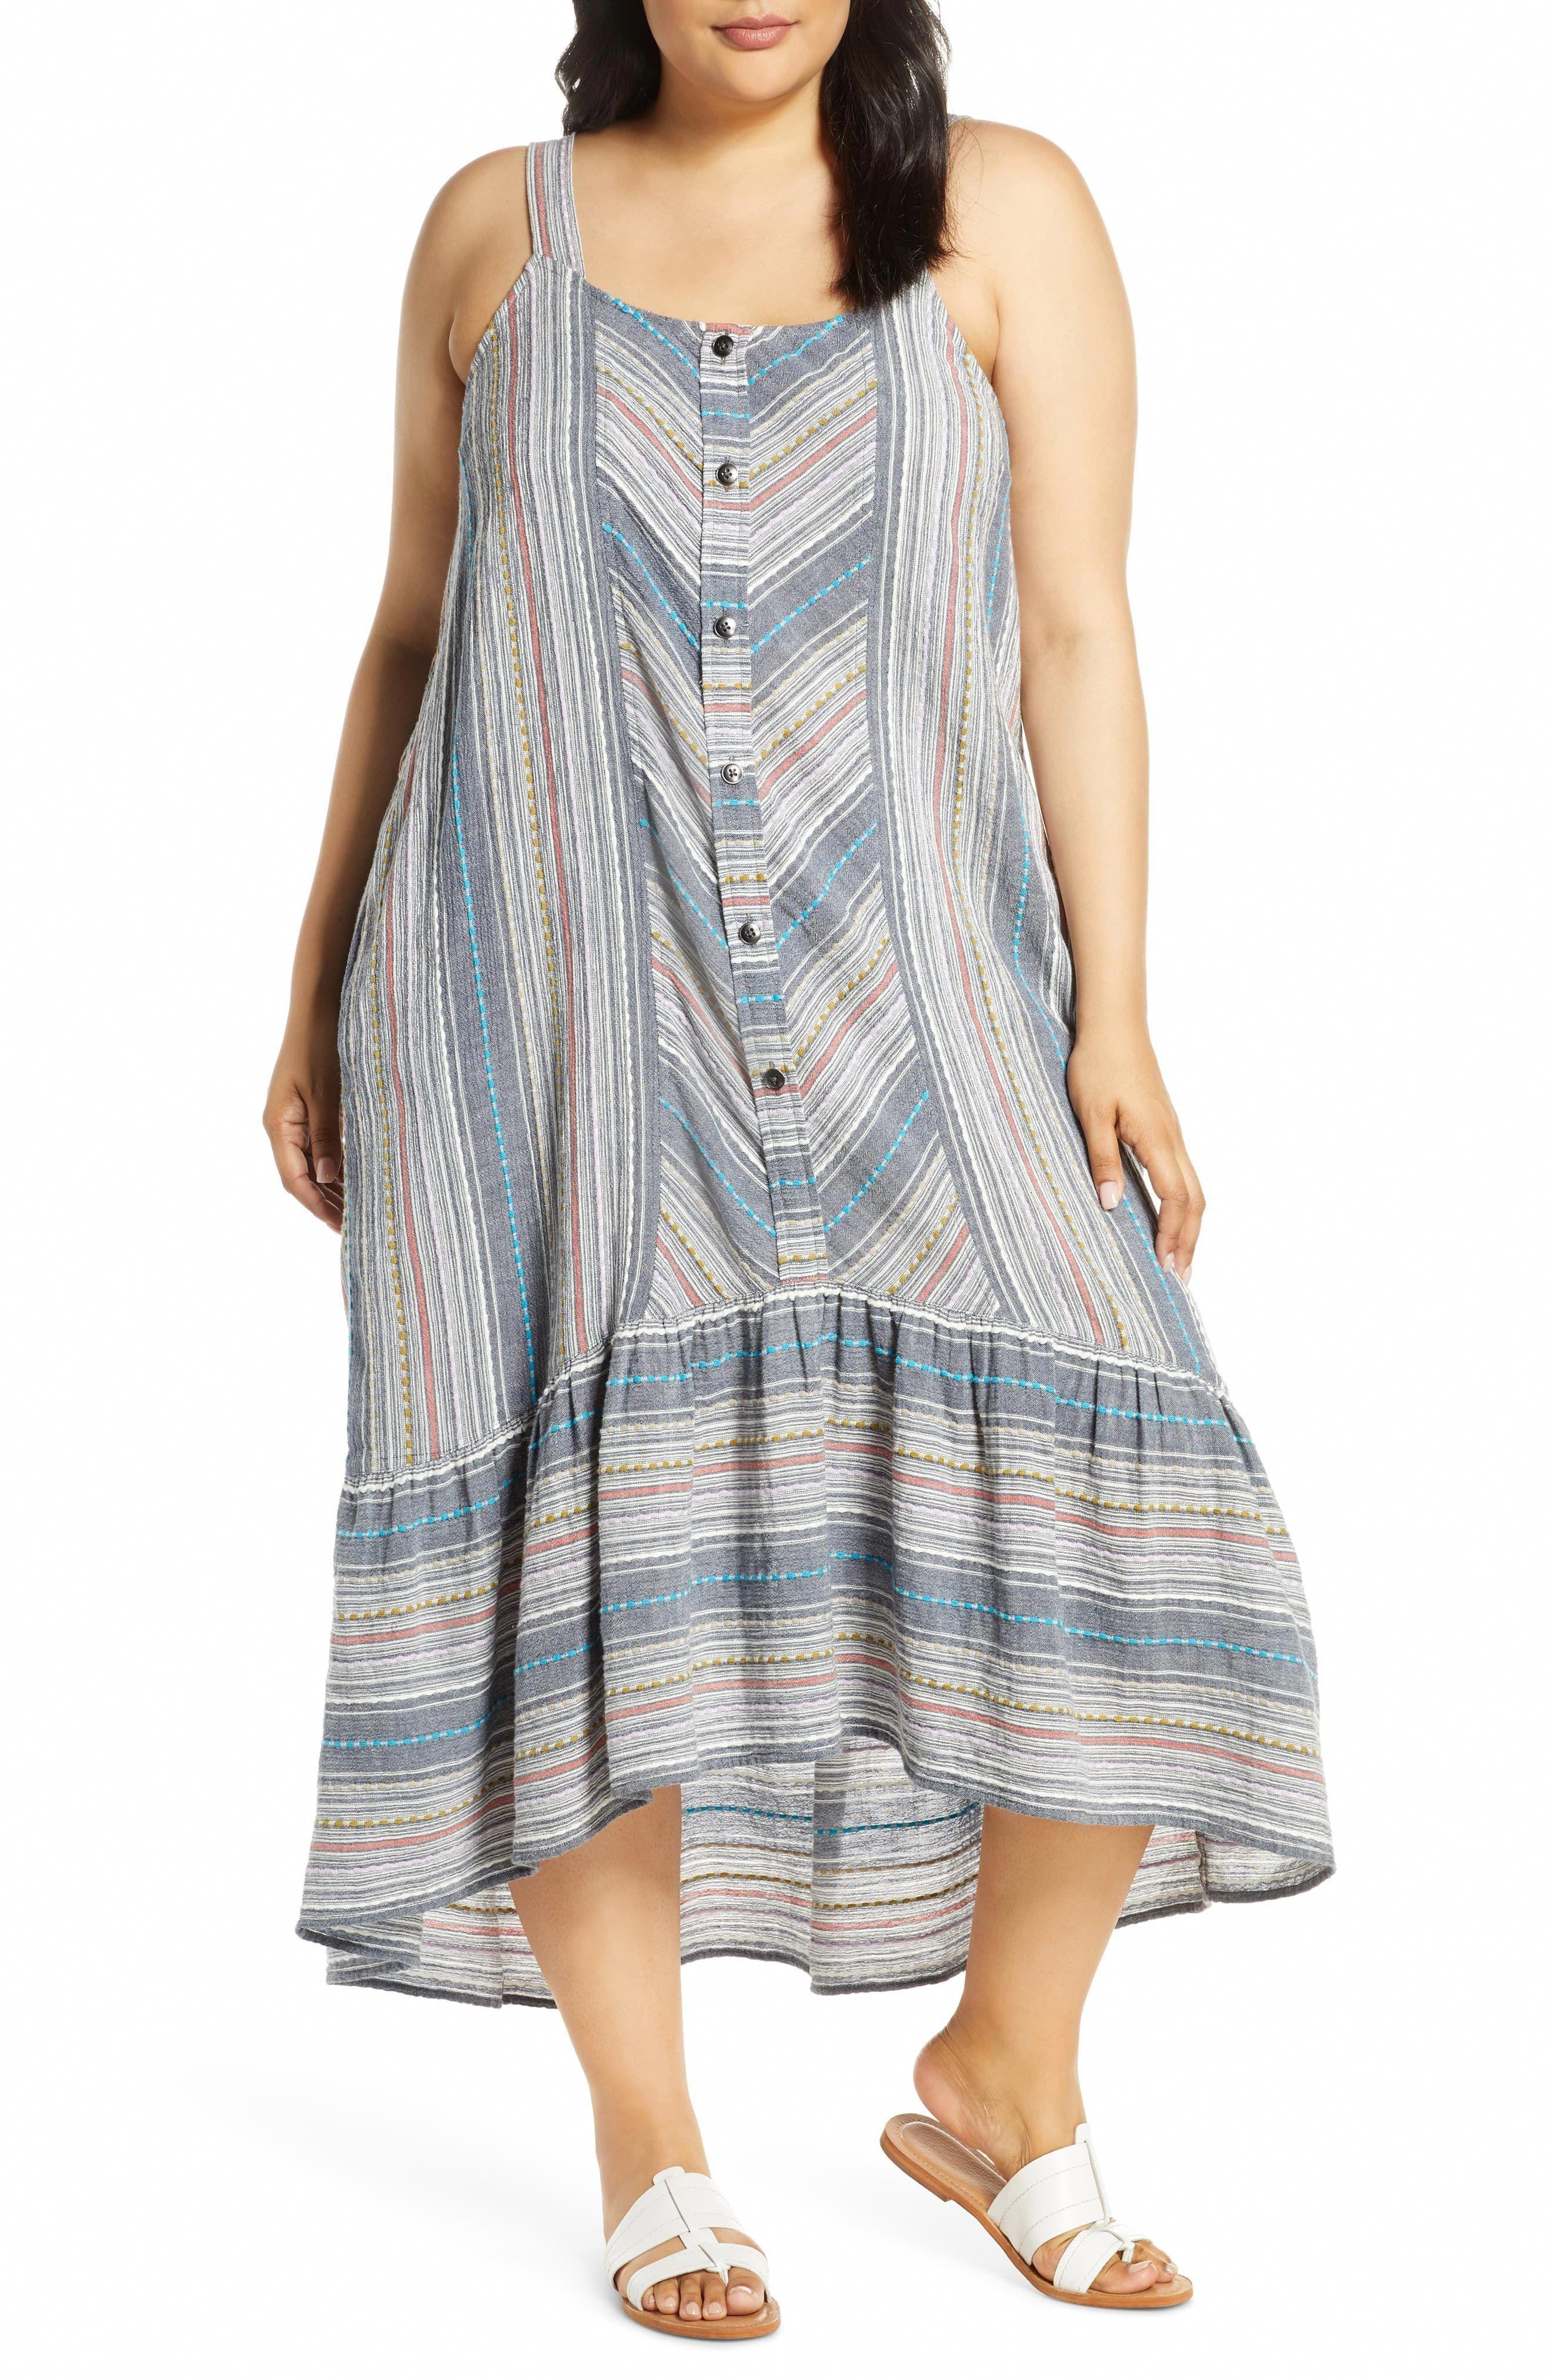 Plus Size Women S Caslon Stripe High Low Cotton Maxi Dress Size 2x Blue Plussizefashionforwomendresses Maxi Dress Cotton Plus Size Maxi Dresses Cotton Maxi [ 4048 x 2640 Pixel ]